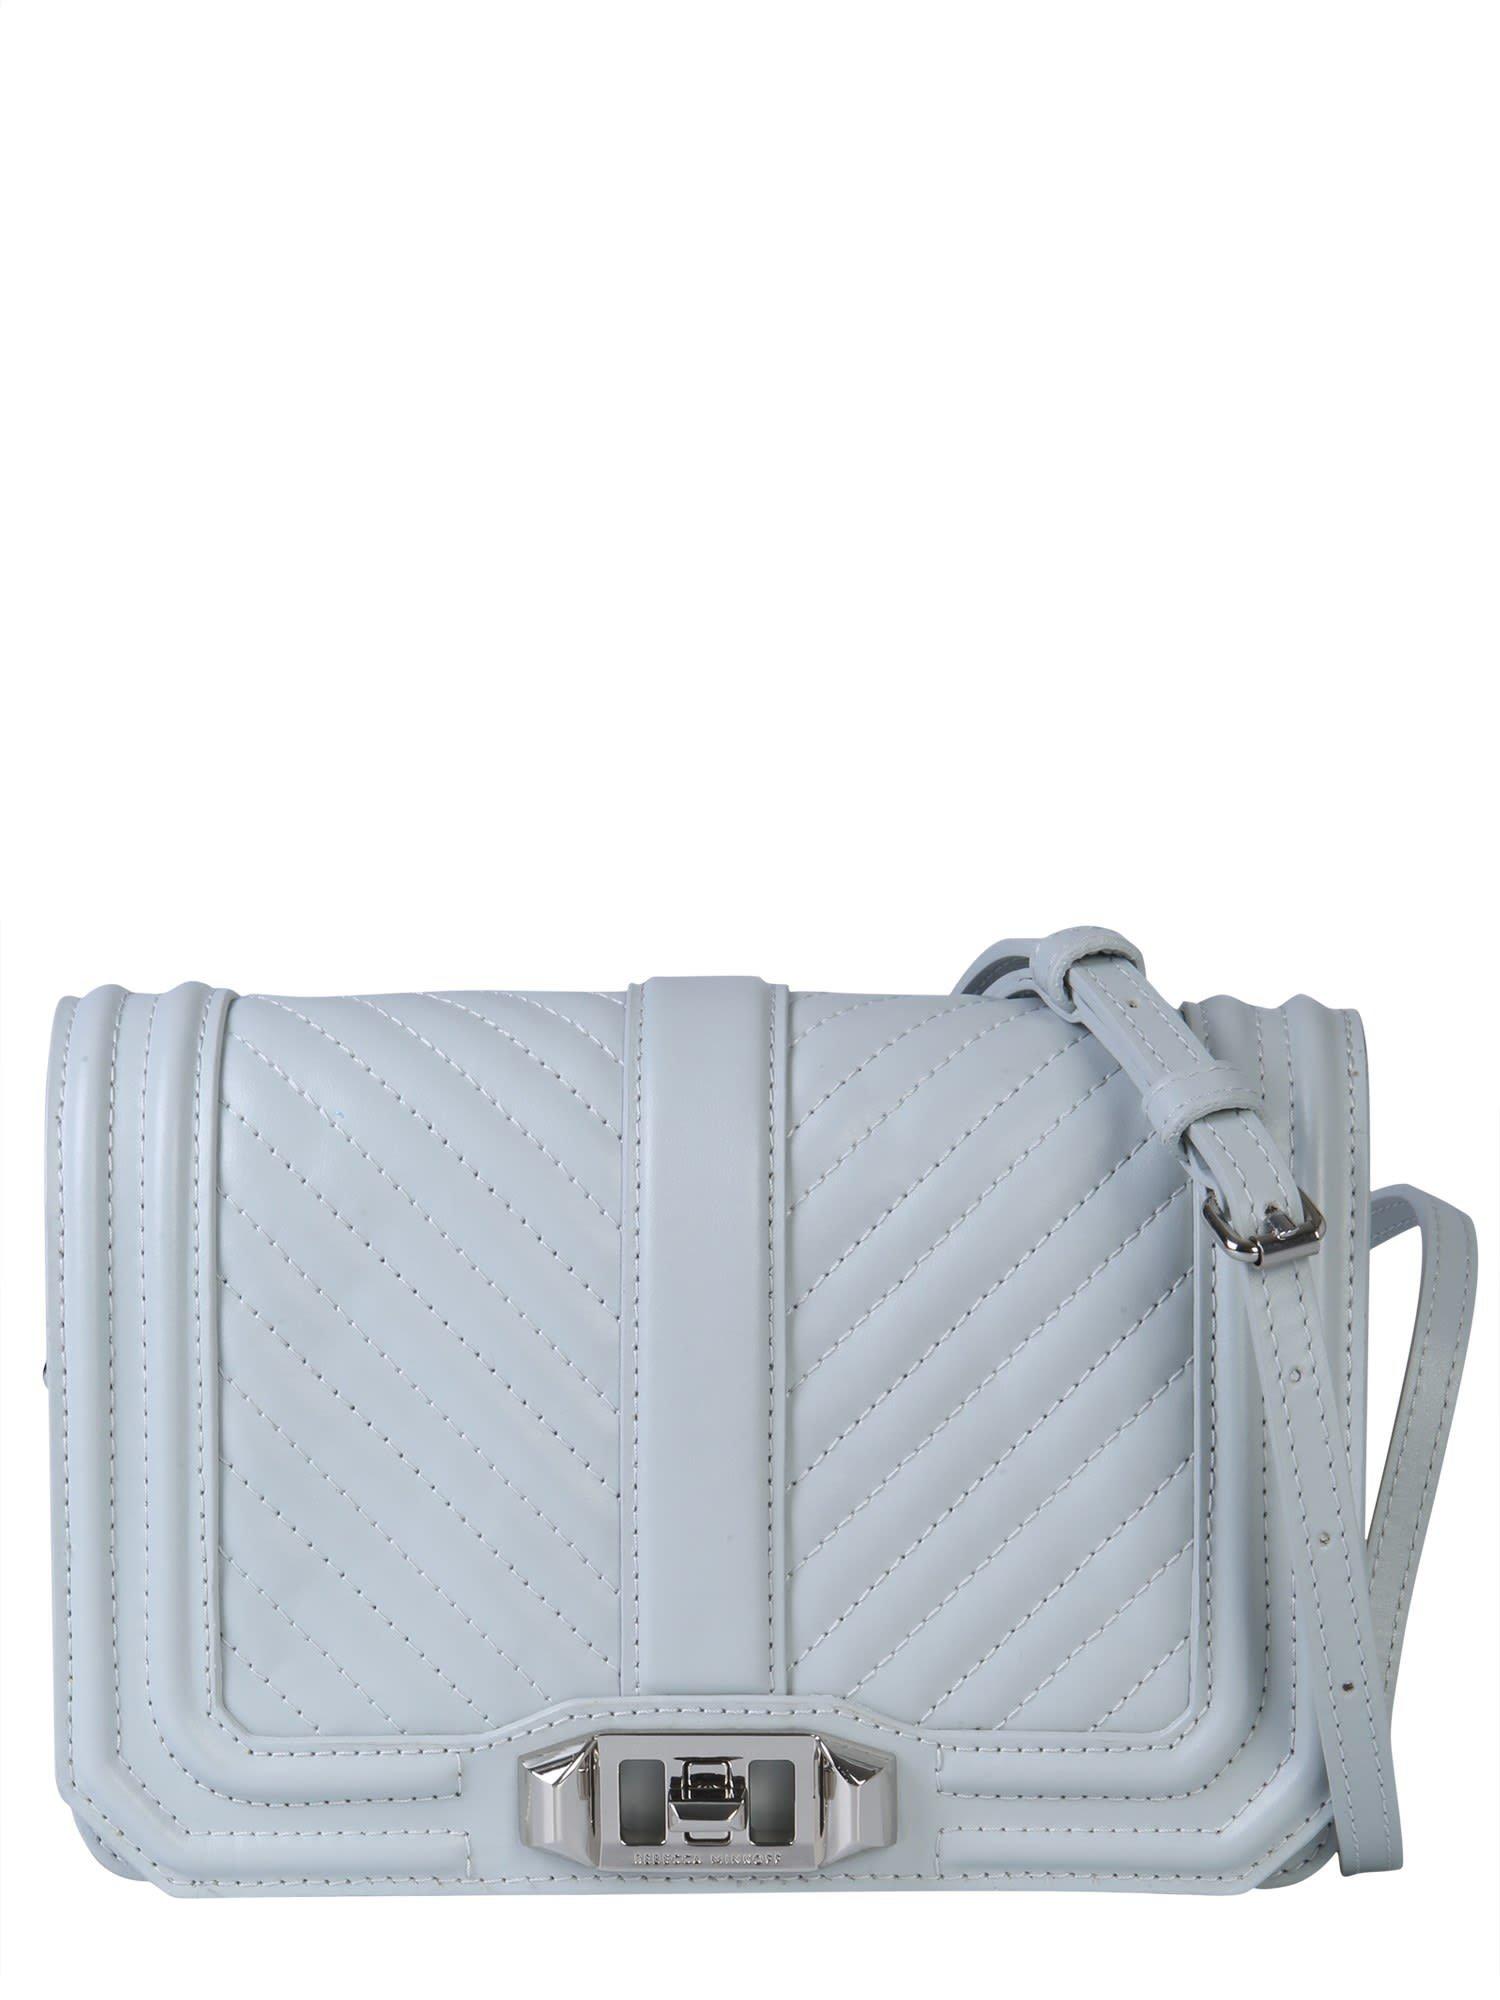 Rebecca Minkoff Small Love Shoulder Bag